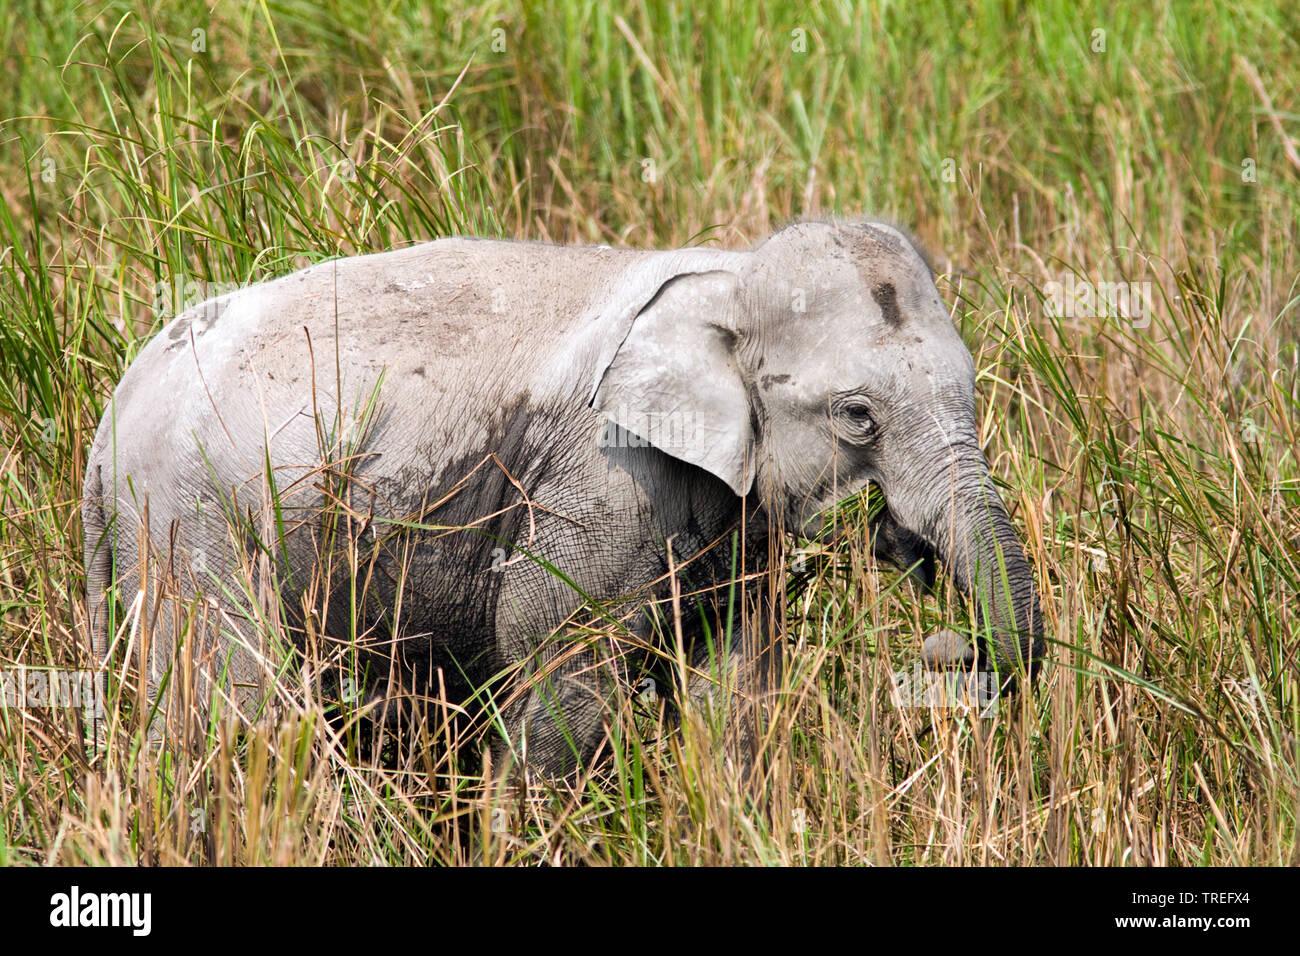 Indischer Elefant, Asiatischer Elefant (Elephas maximus indicus, Elephas maximus Bengalensis), beim Fressen, Indien, Kaziranga Nationalpark | Indische e Stockbild